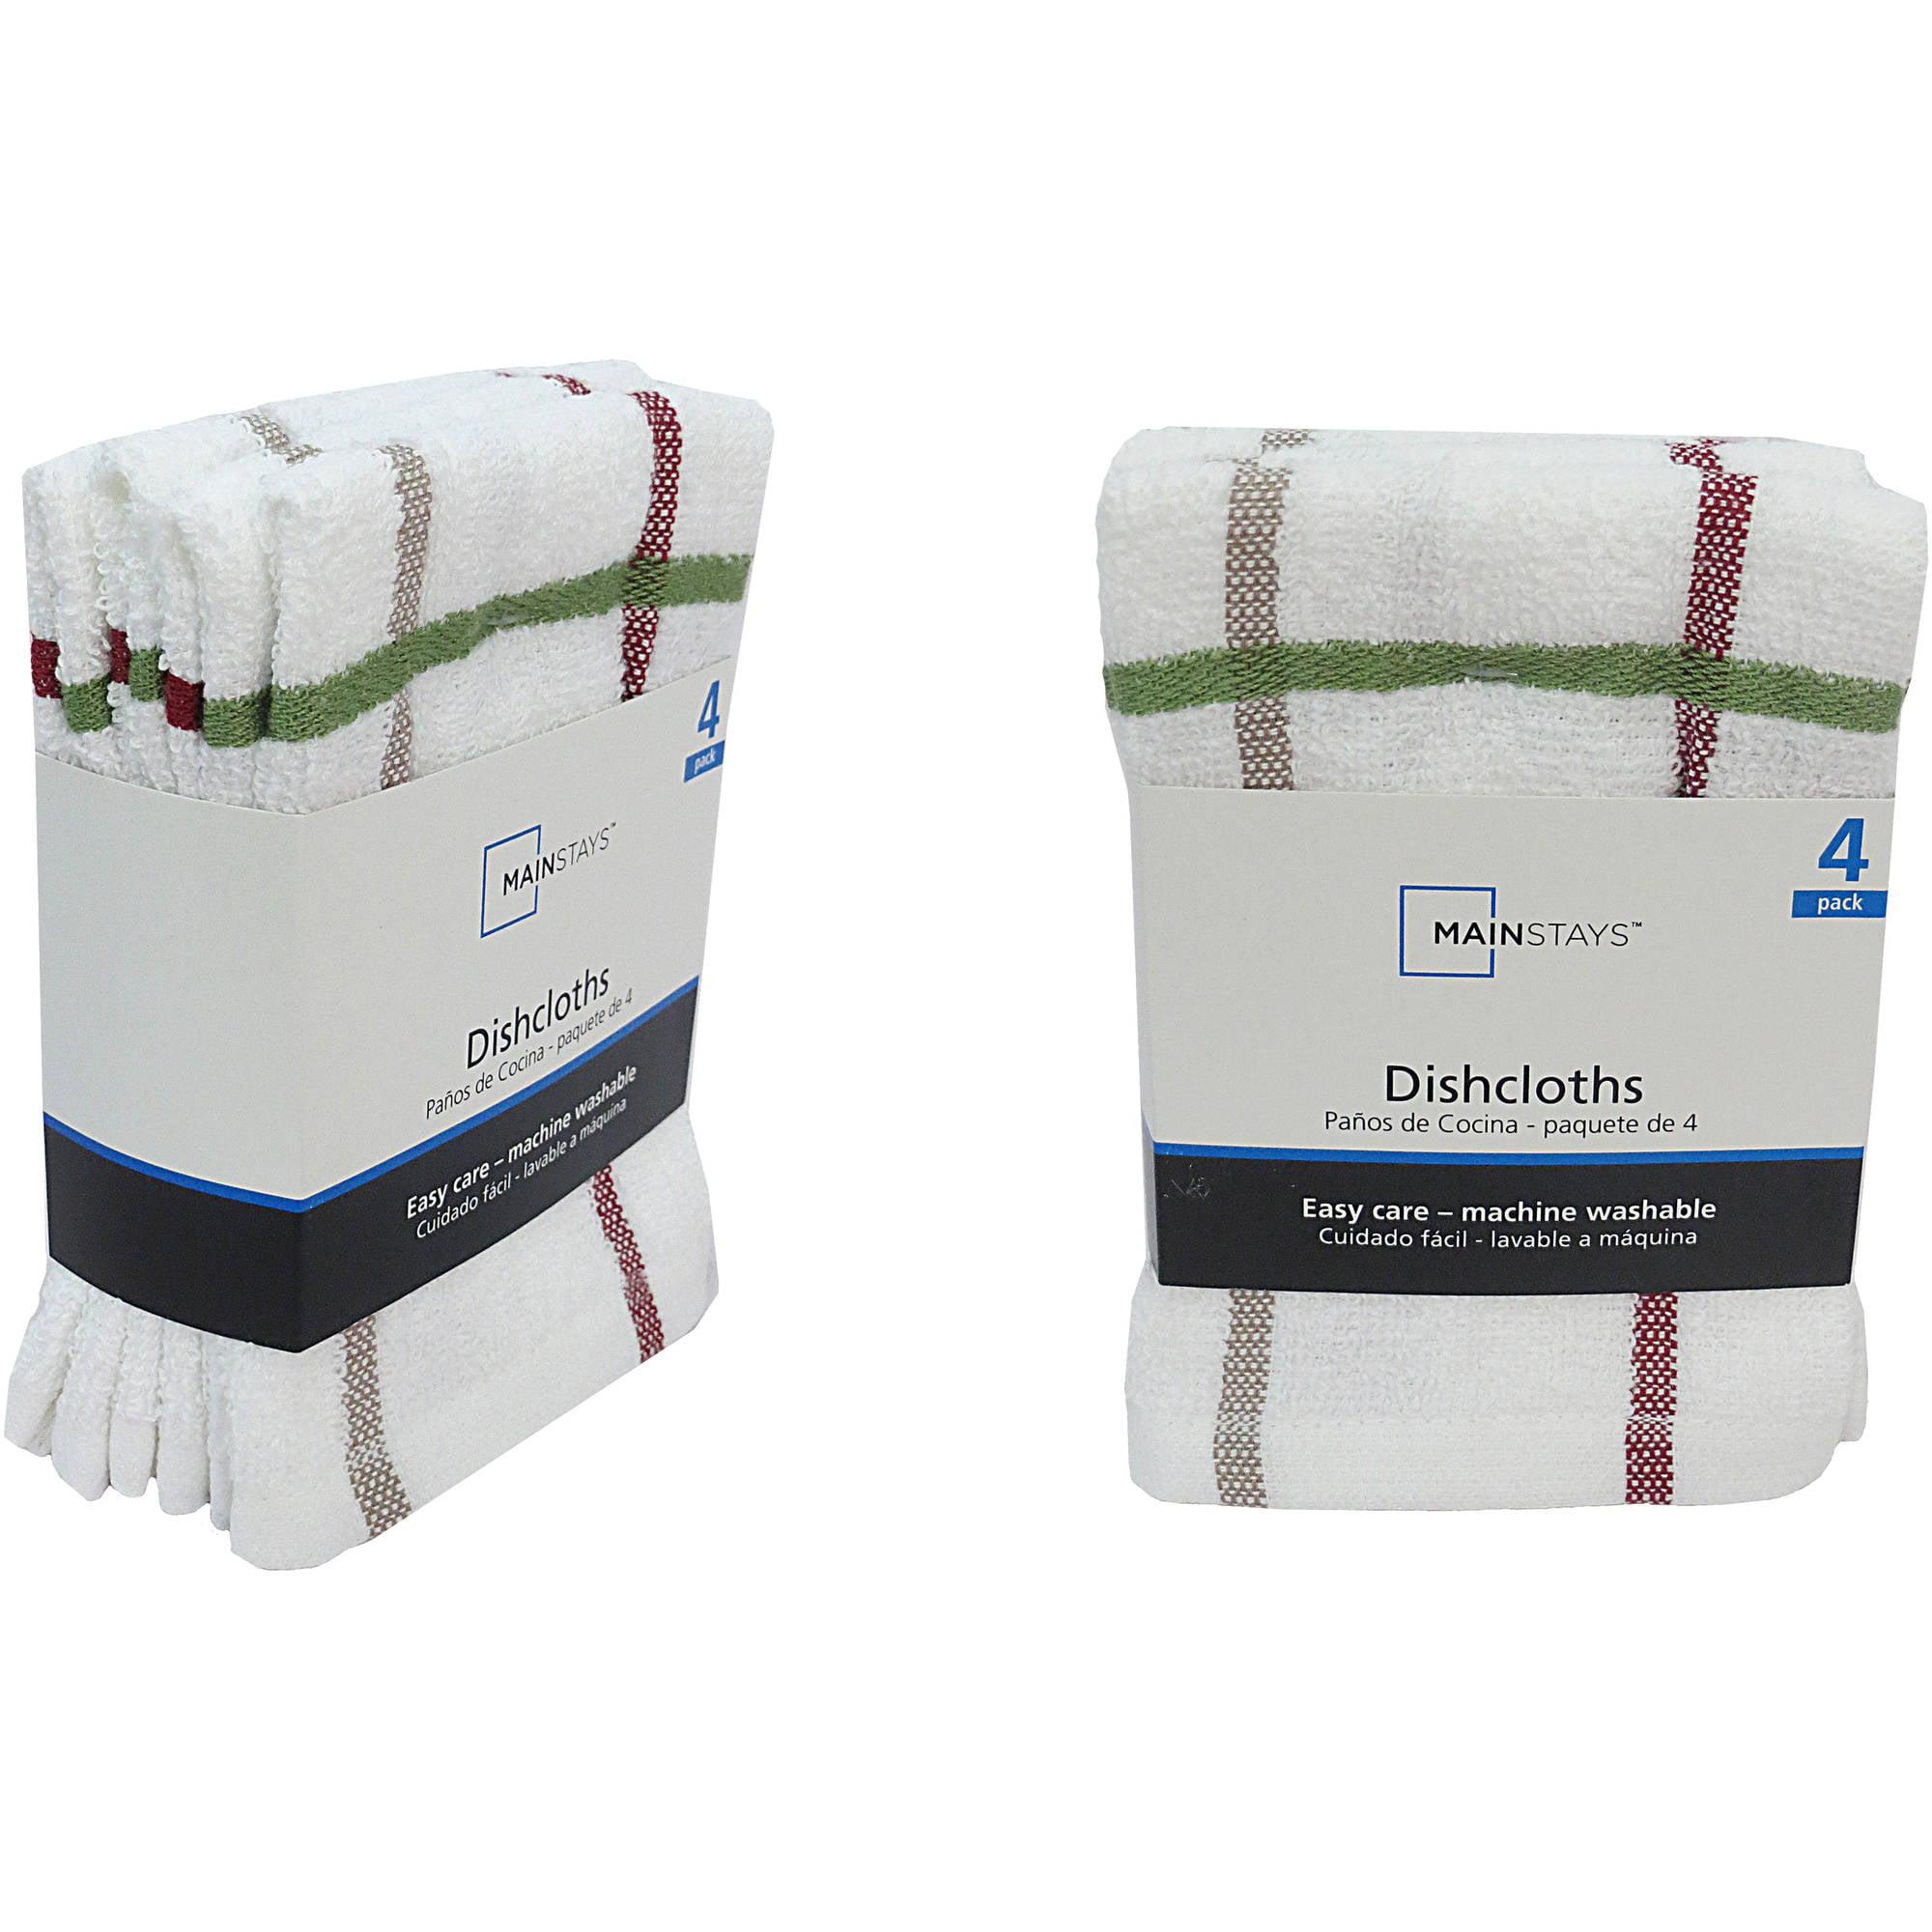 Walma Com: Mainstays 4 Pack Dish Cloth Multi